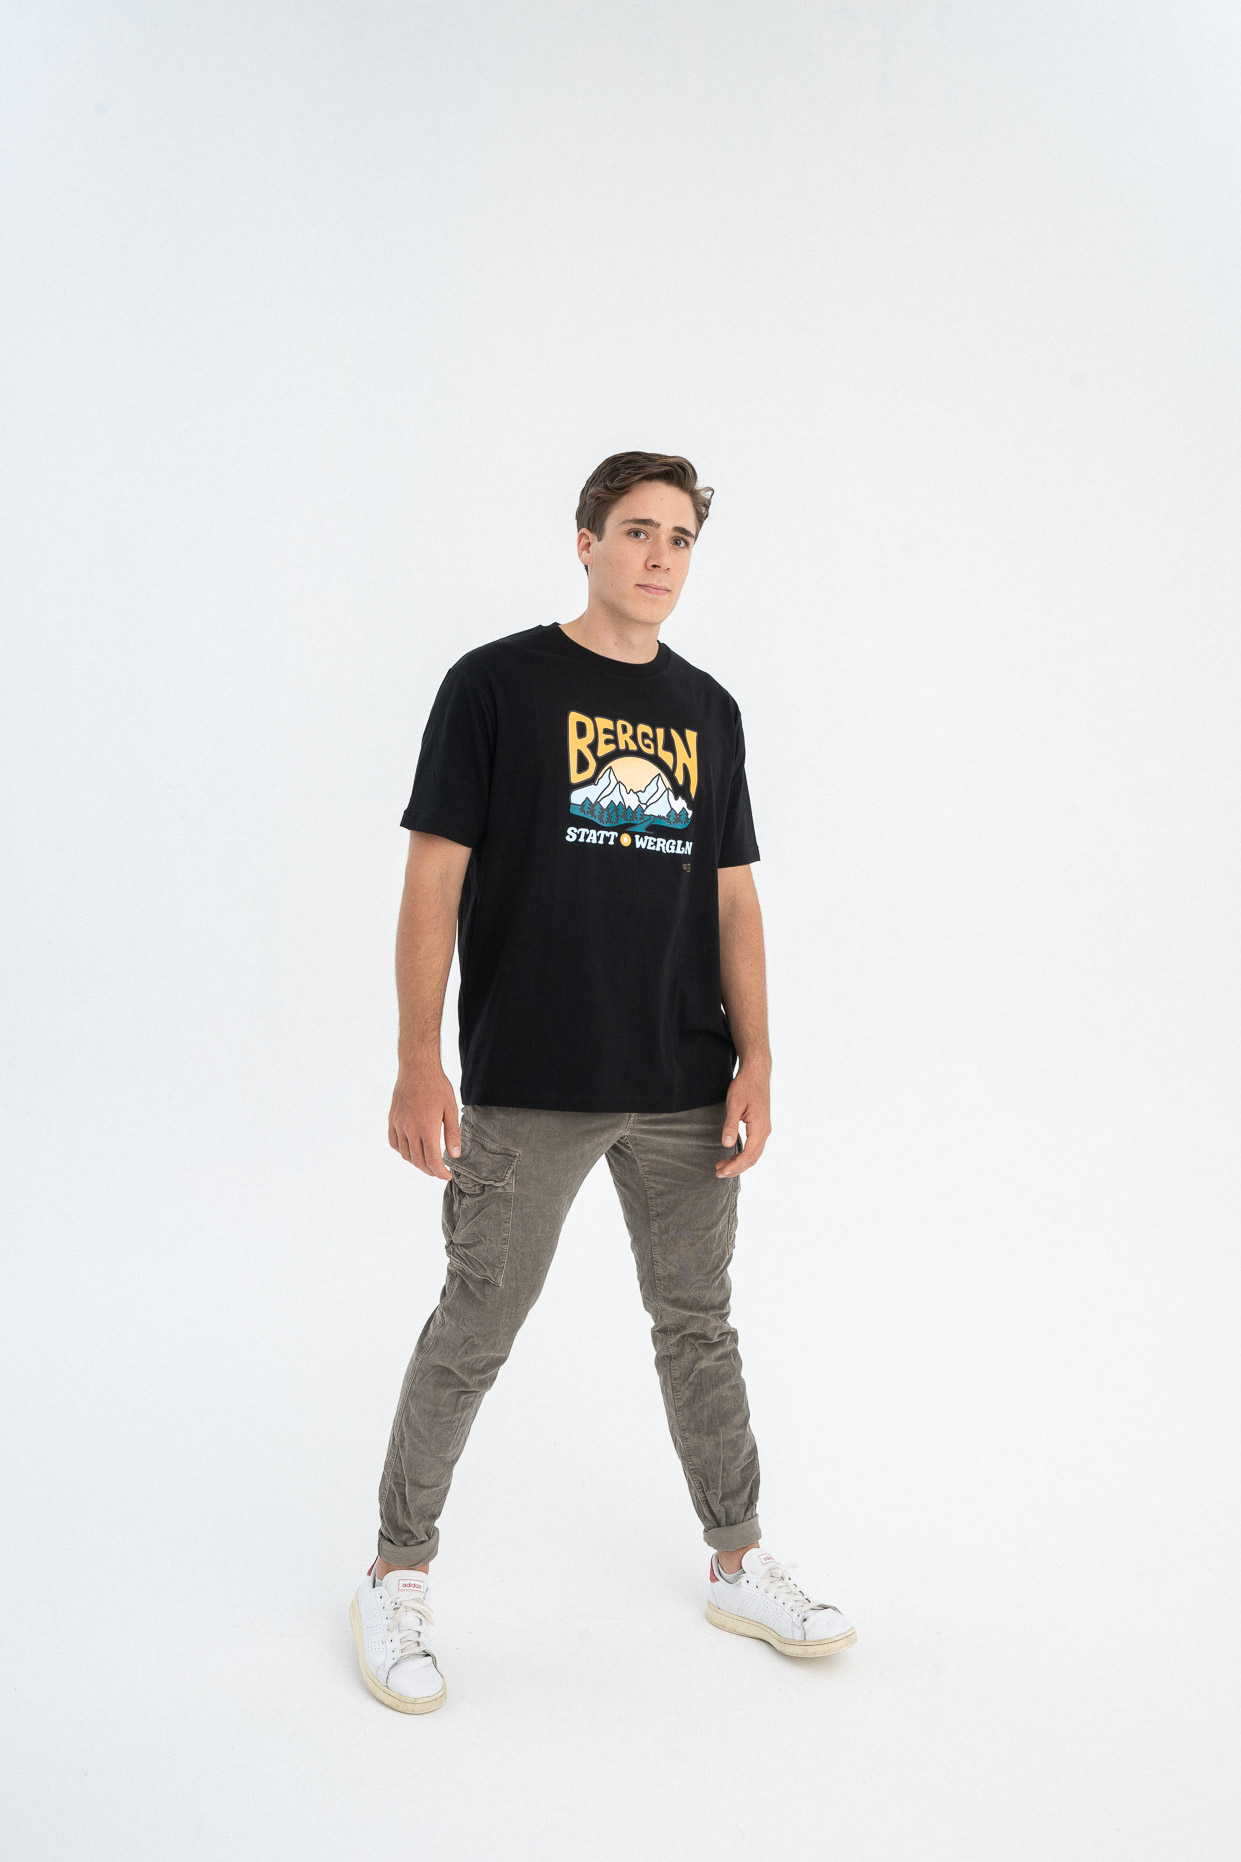 Bergln T-Shirt